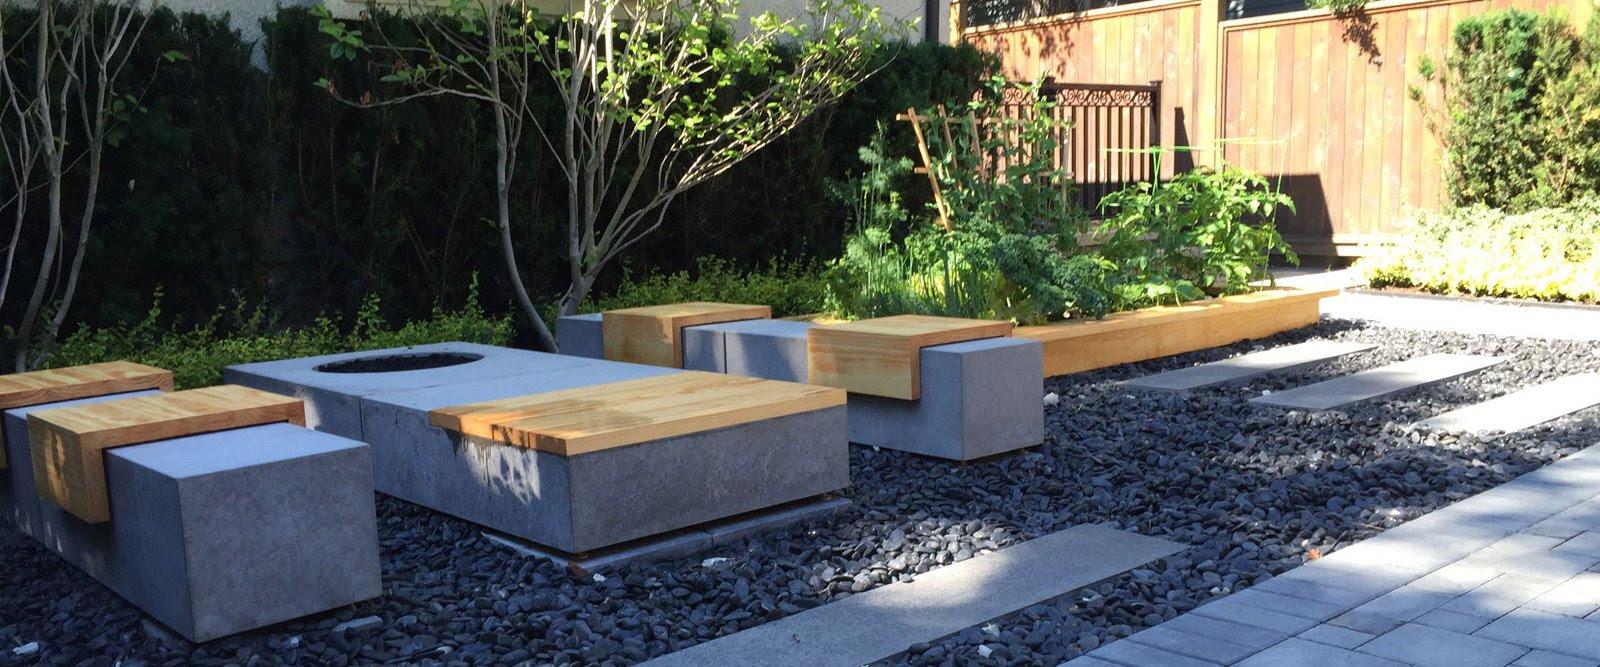 Landscaping Vancouver Landscape Design Vancouver